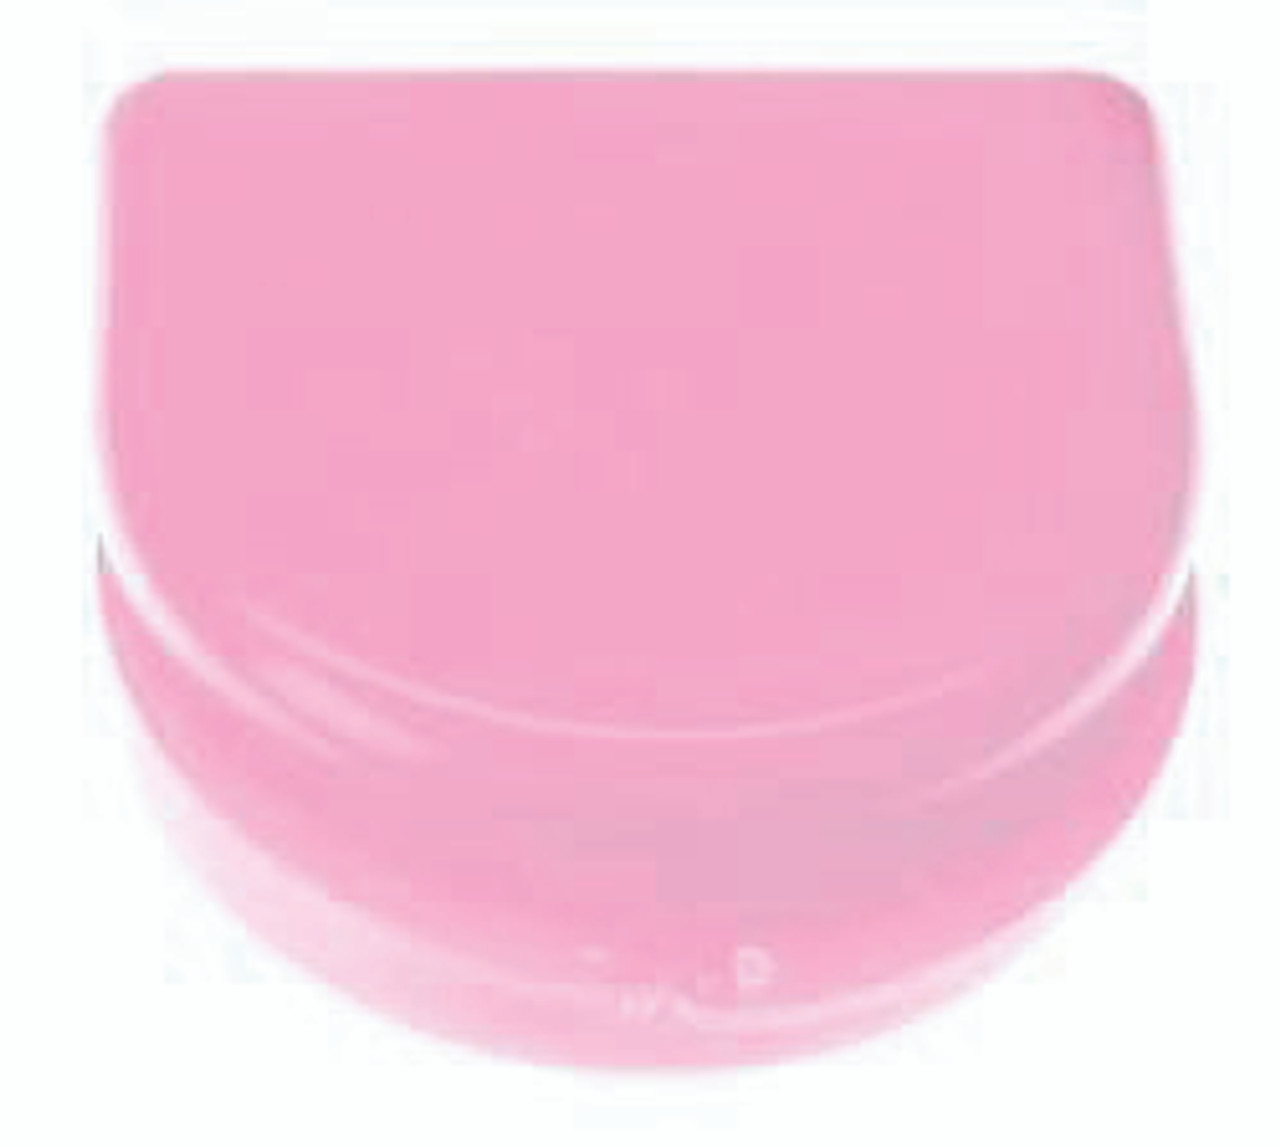 Pink Glow Retainer Cases - 25 pk